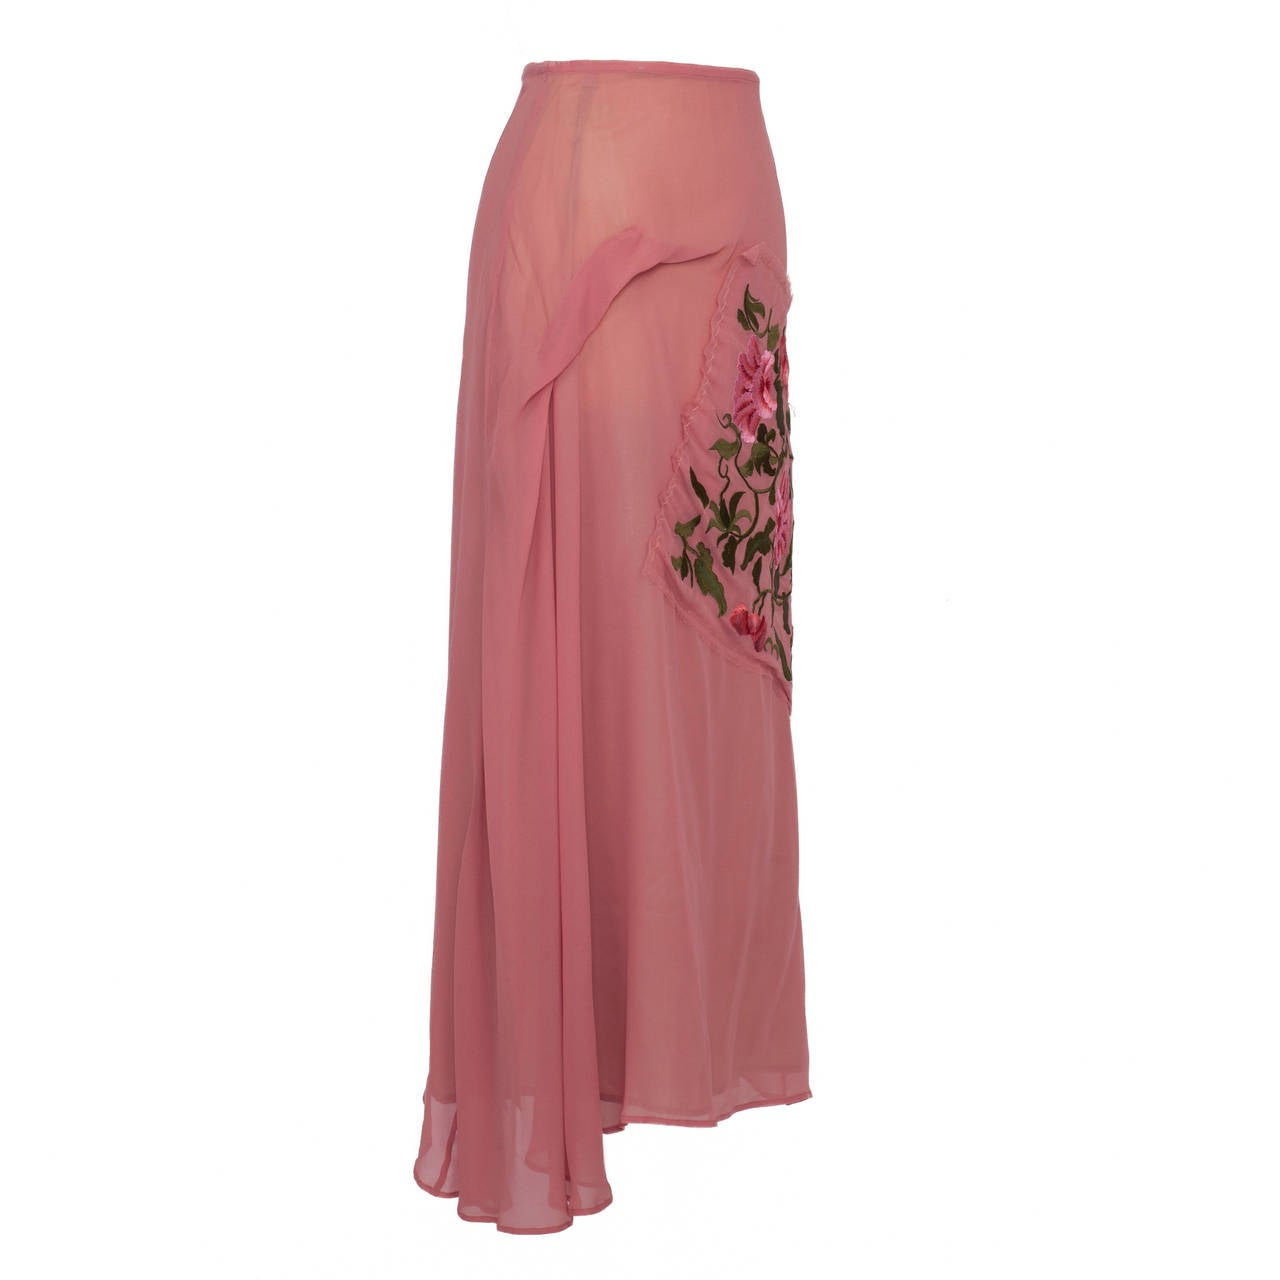 Yohji Yamamoto + Noir Pink Skirt Flower Embroidery